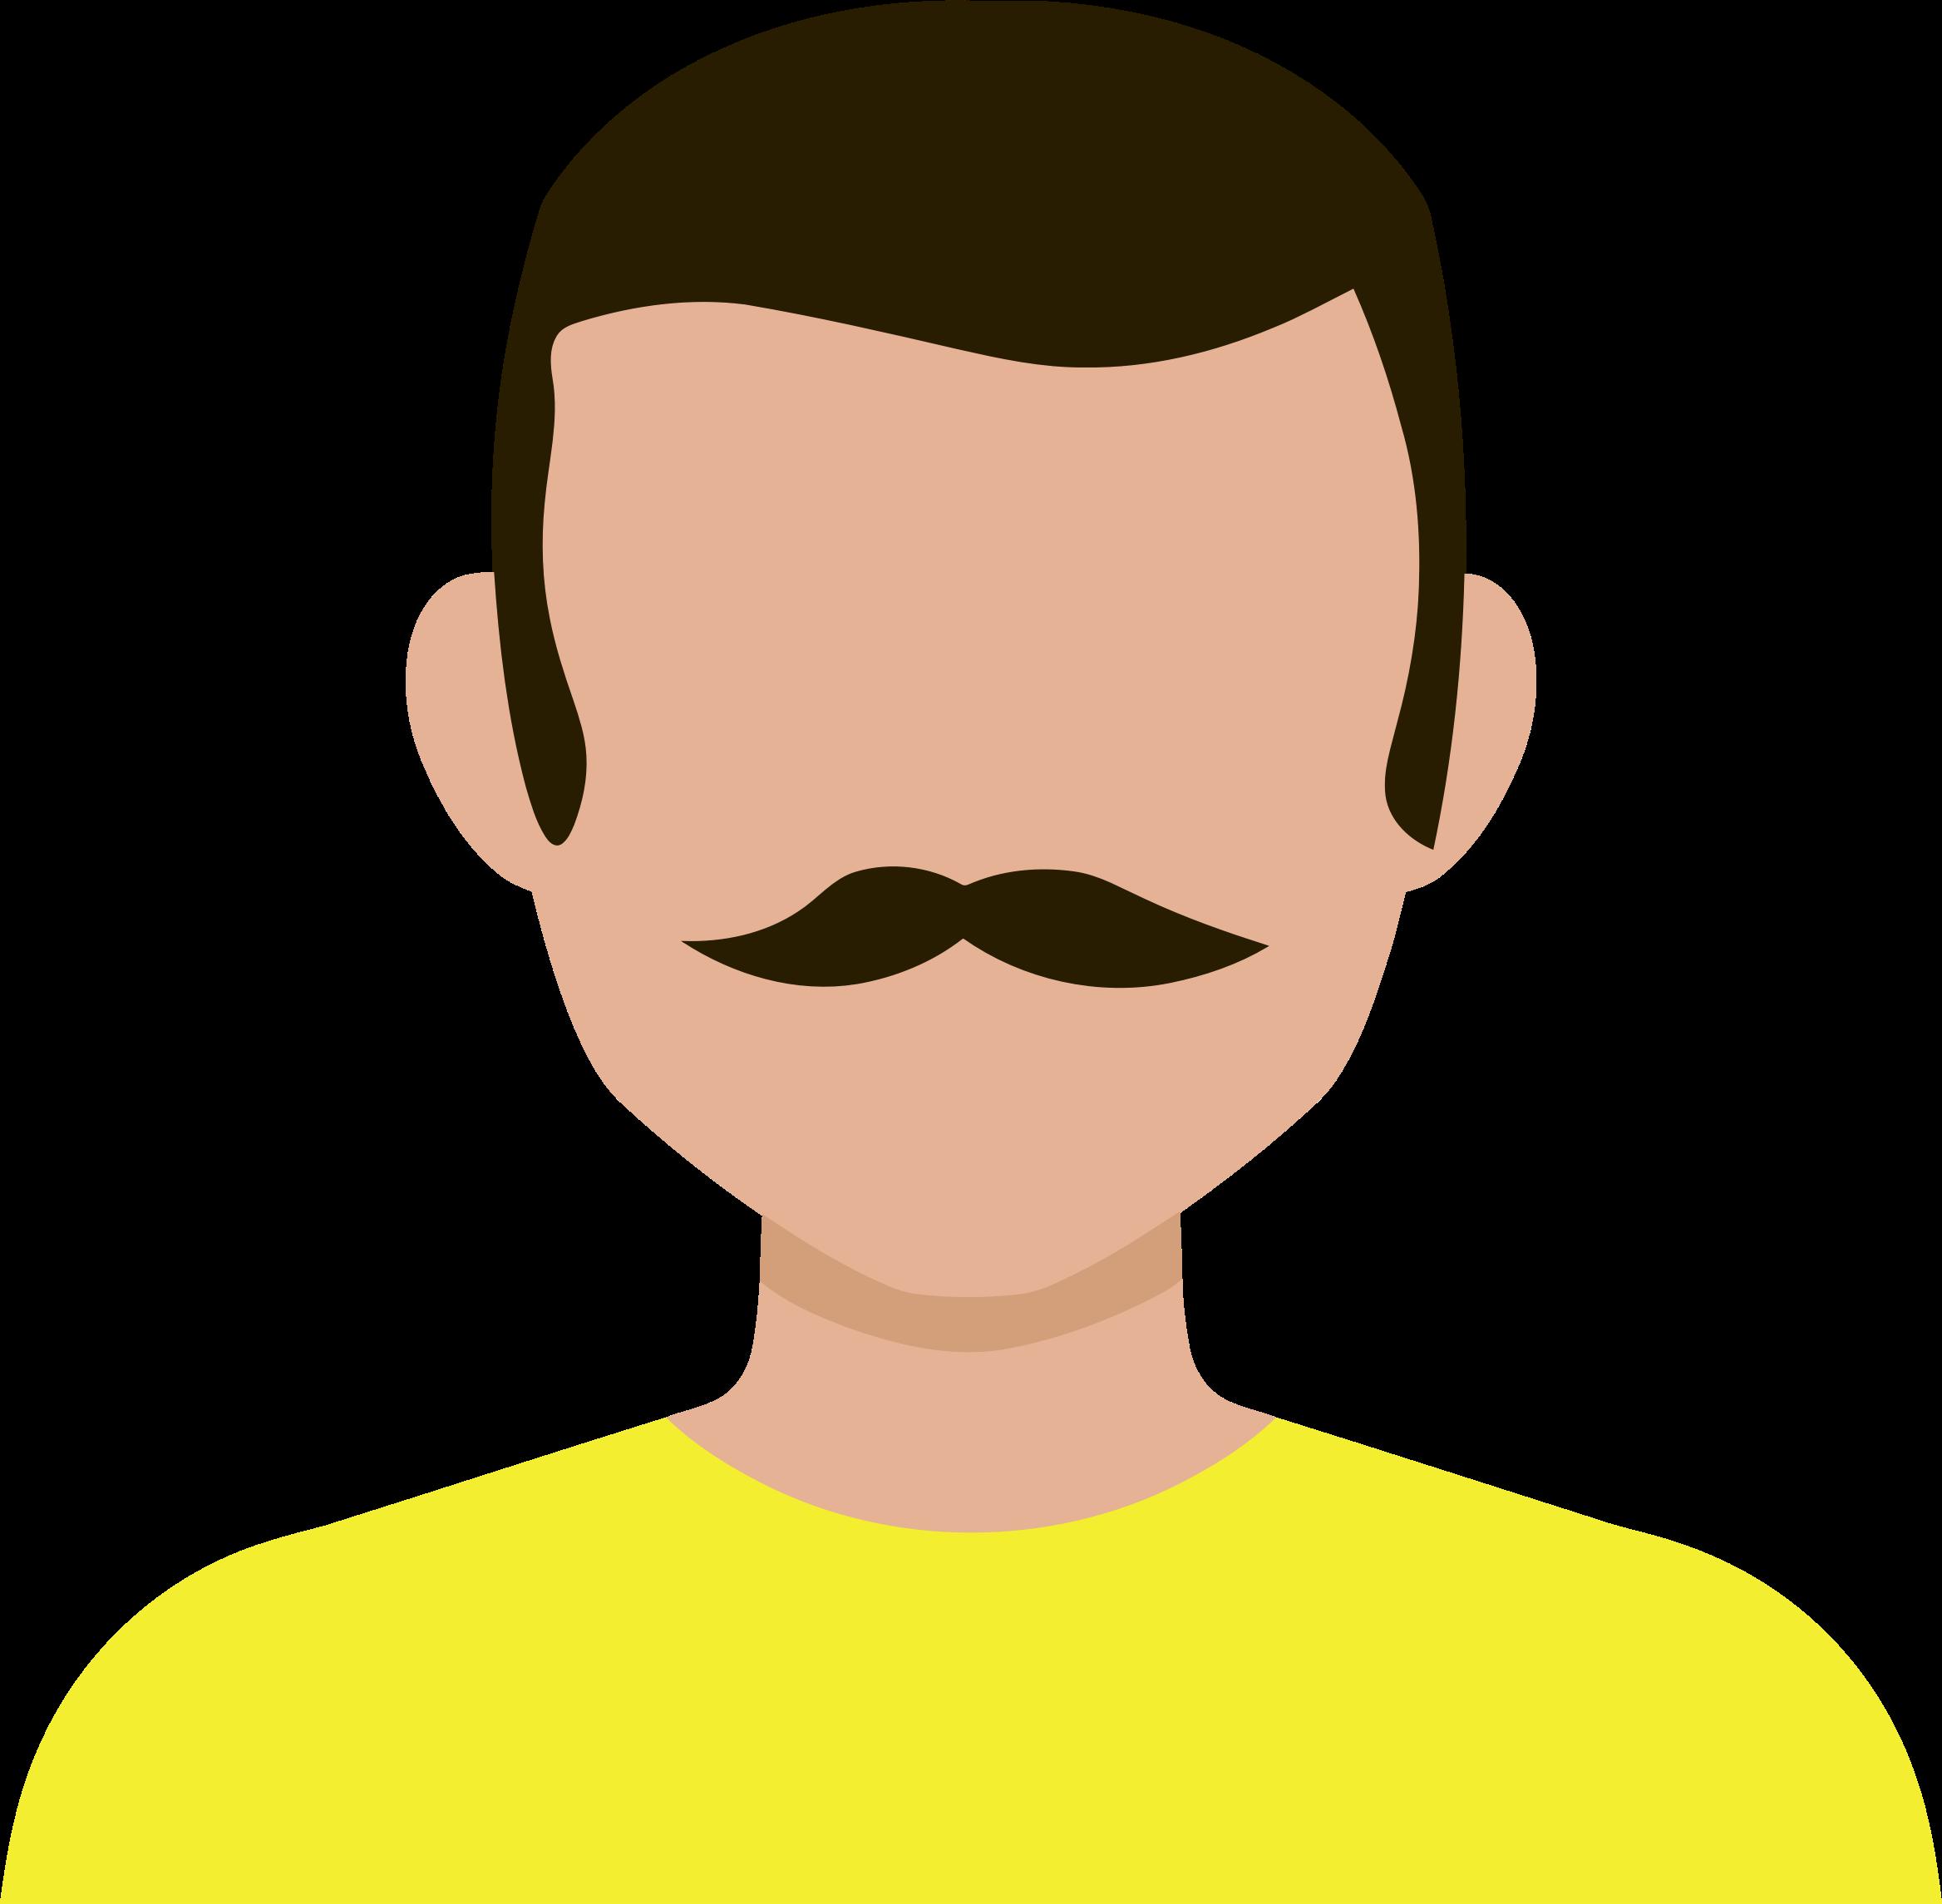 Male avatar big image. Clipart boy nose